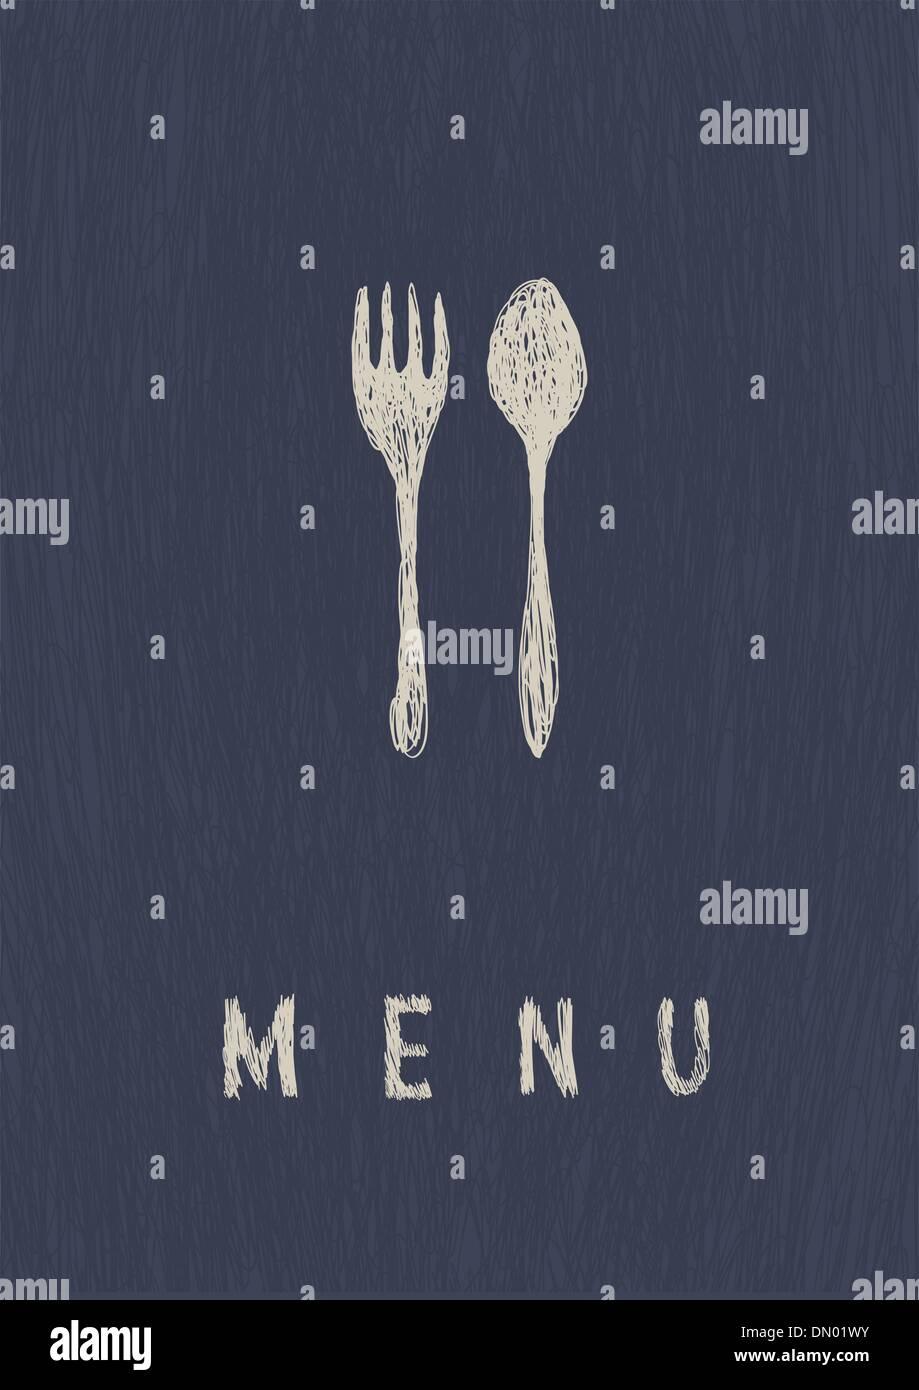 Stylish Restaurant  Menu. A4 format, vector. - Stock Image